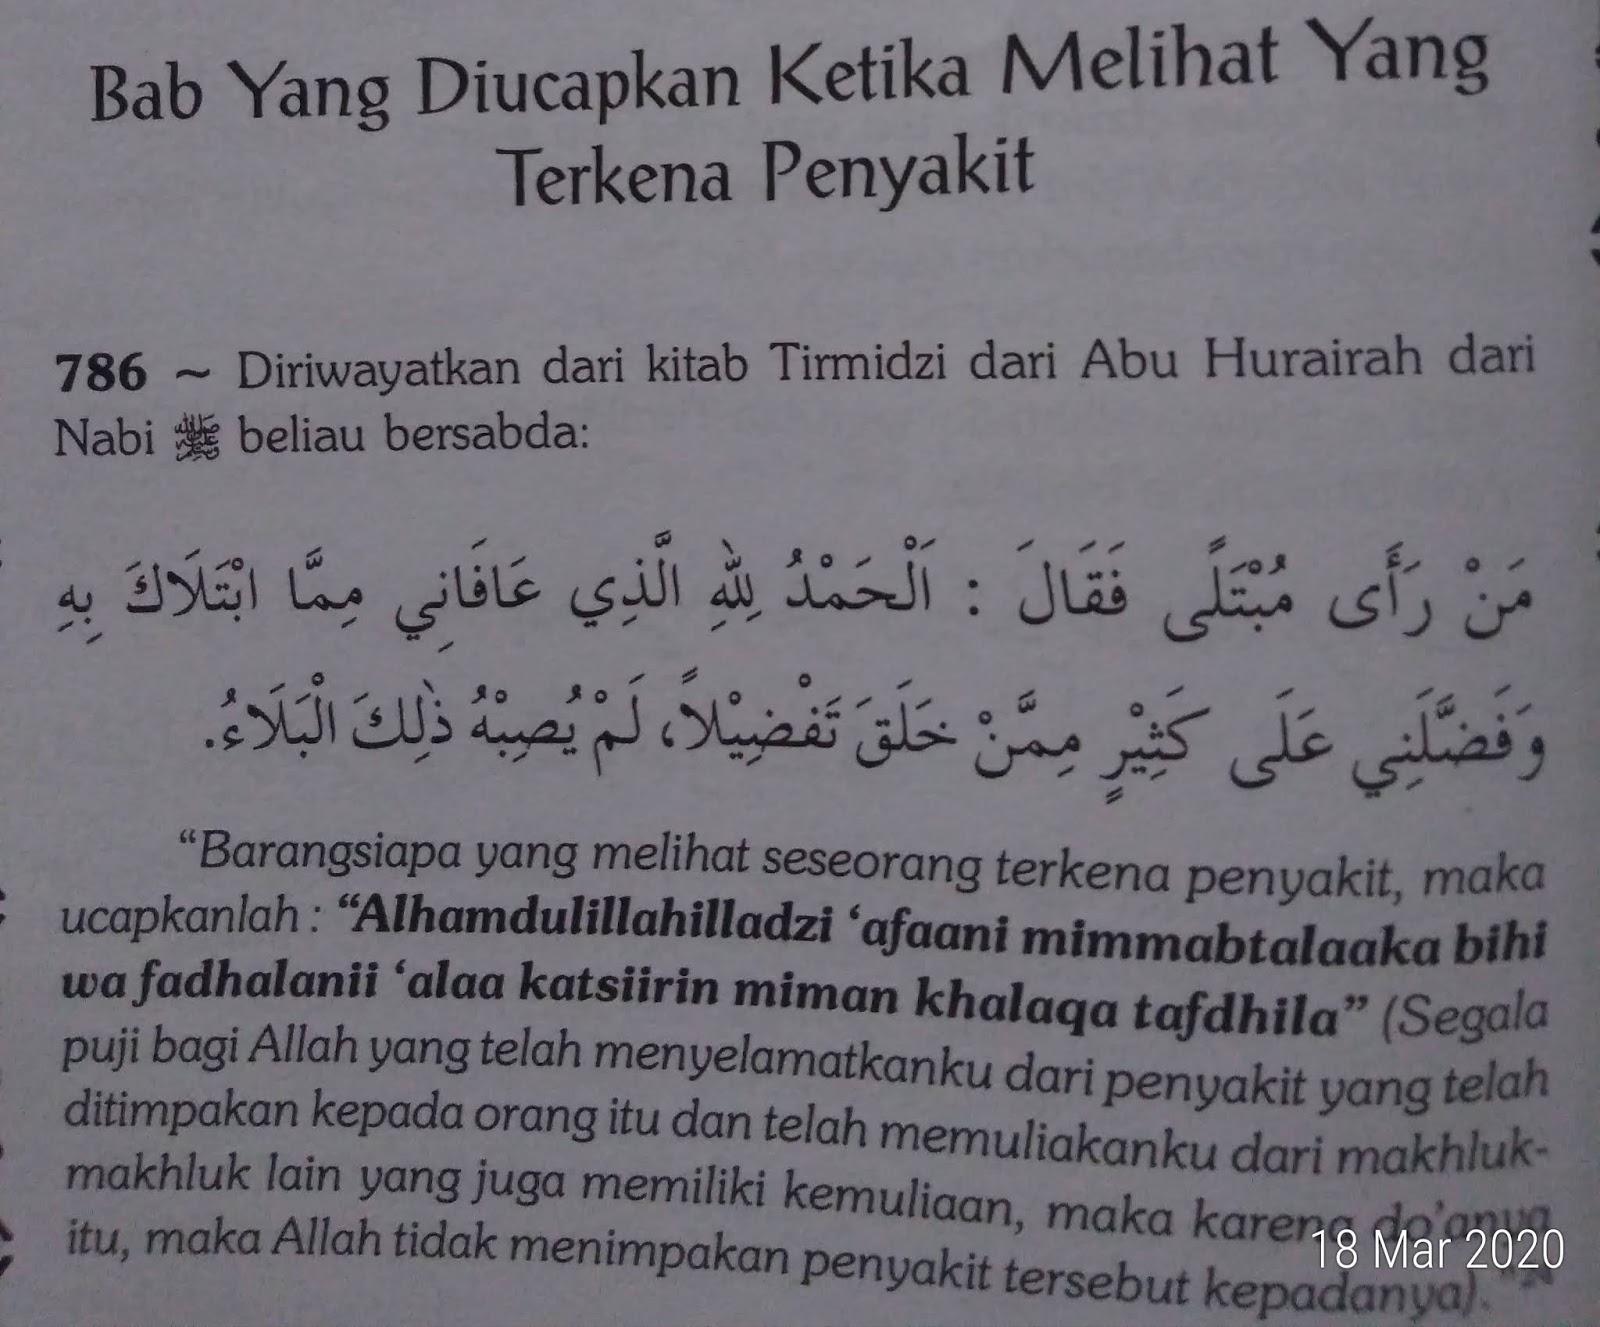 Agar Tak Tertular Corona, Yuk Amalkan Doa Ajaran Nabi Muhammad